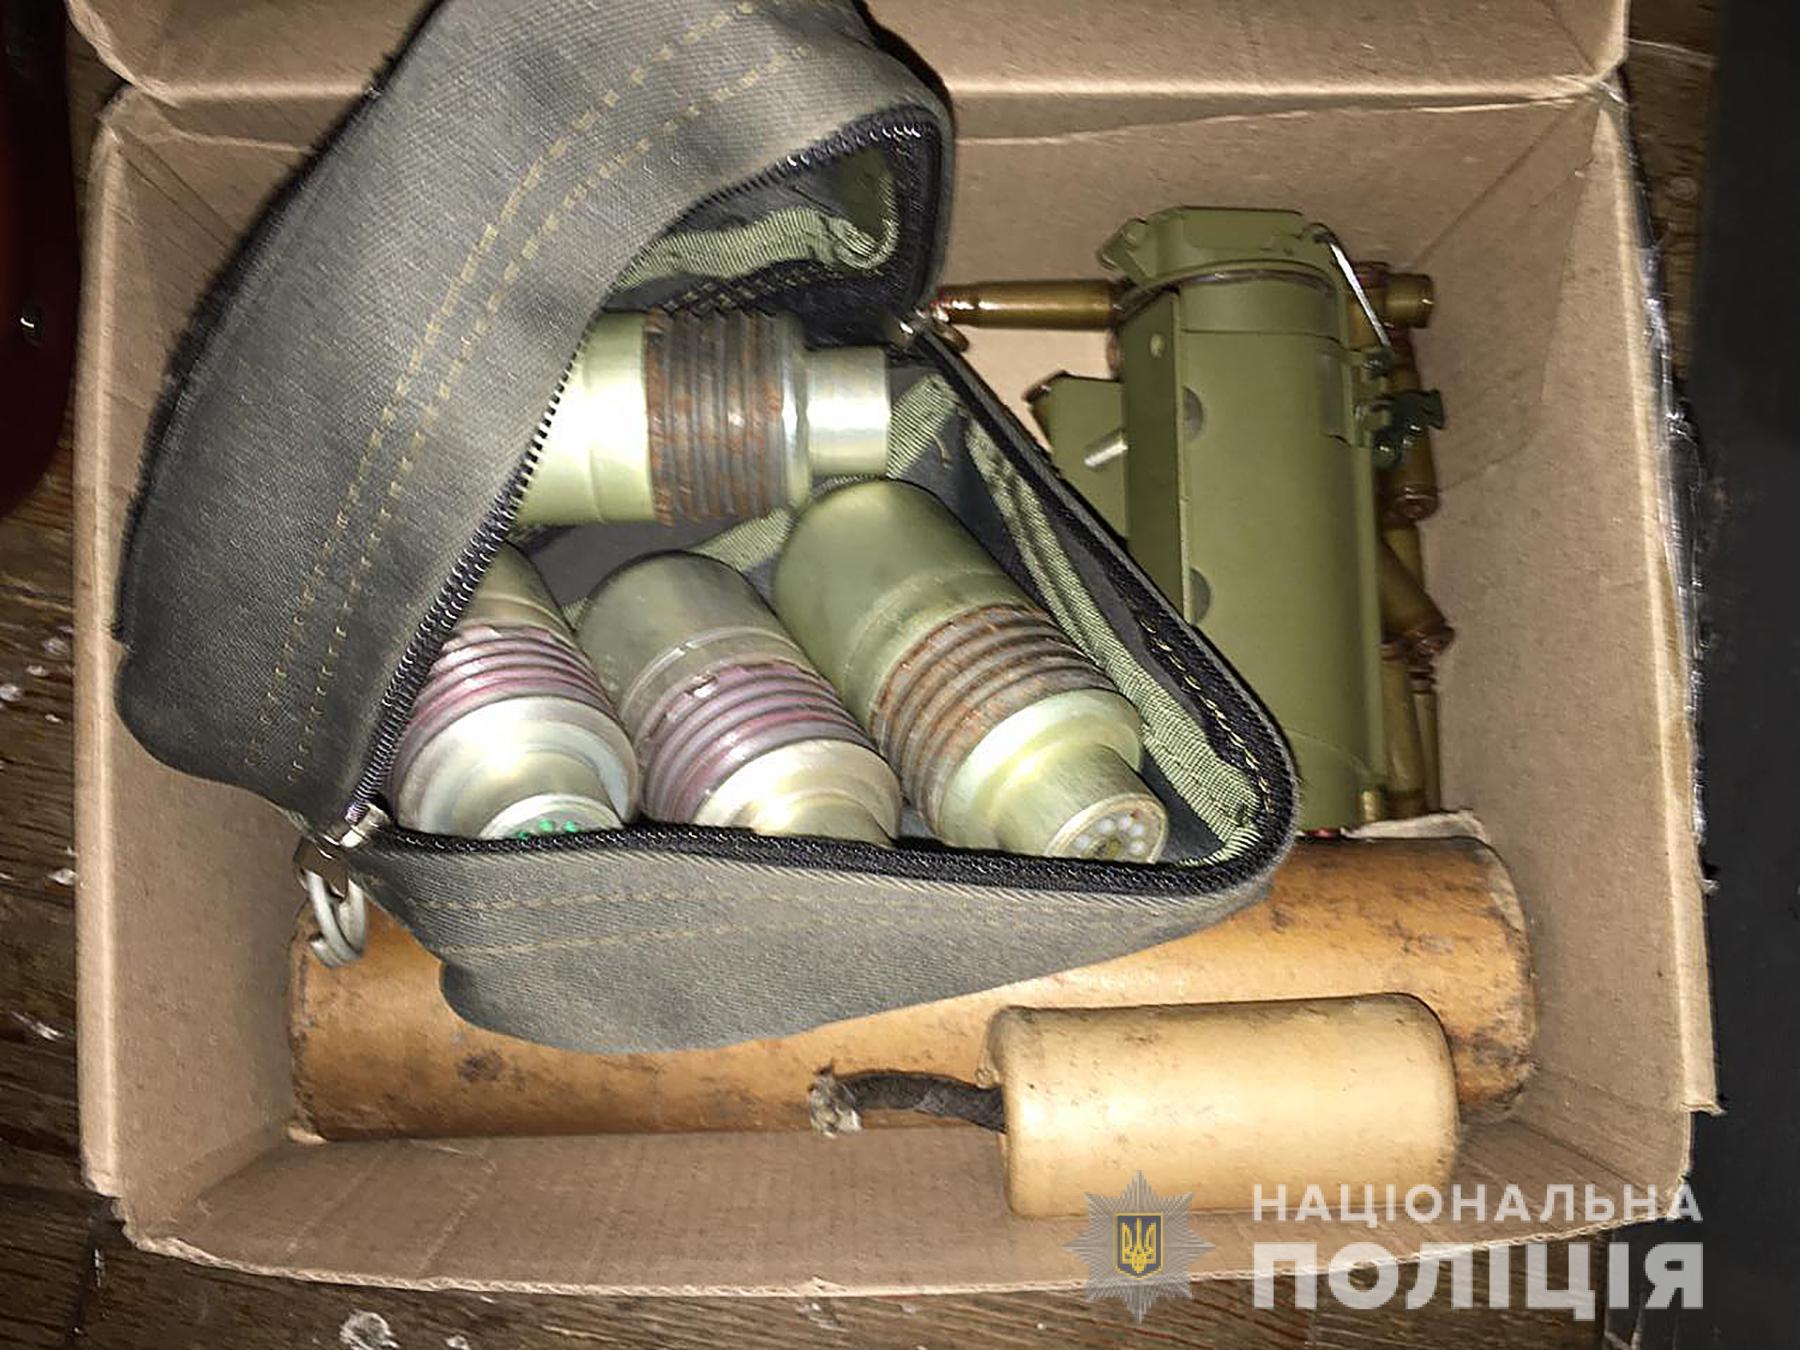 В Бердянске мужчина стрелял по детям, говорит - раздражали крики - полиция